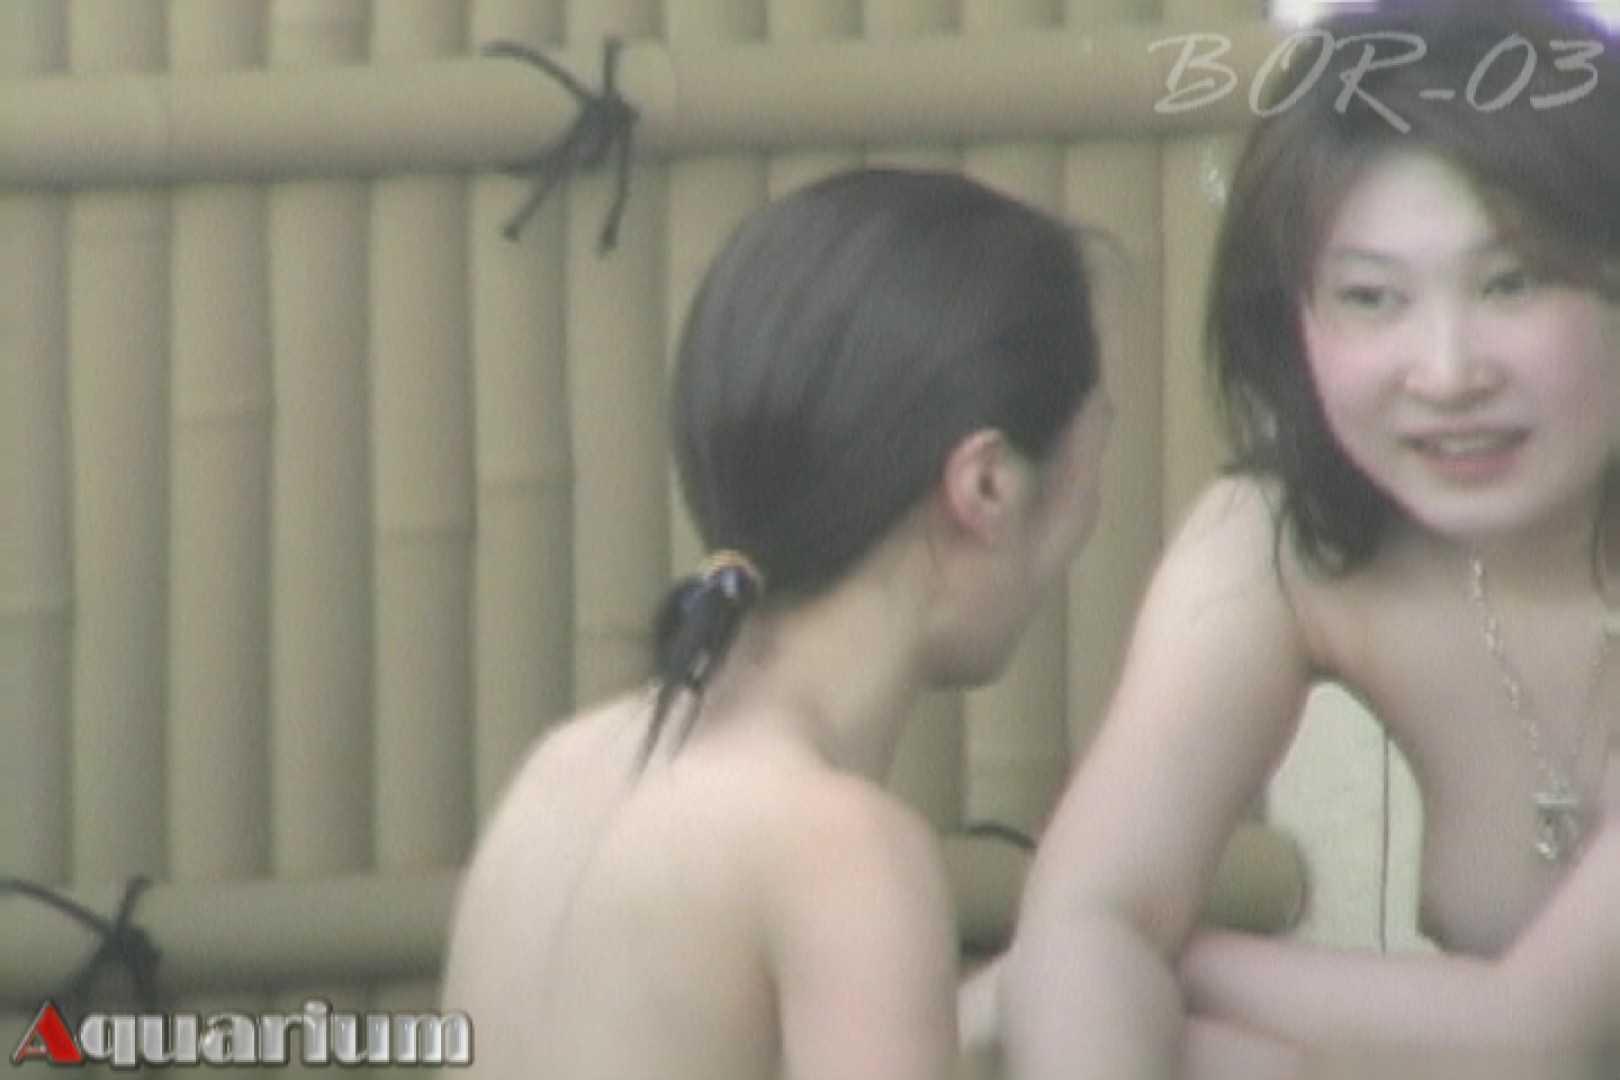 Aquaな露天風呂Vol.486 人気シリーズ オメコ無修正動画無料 106PIX 21